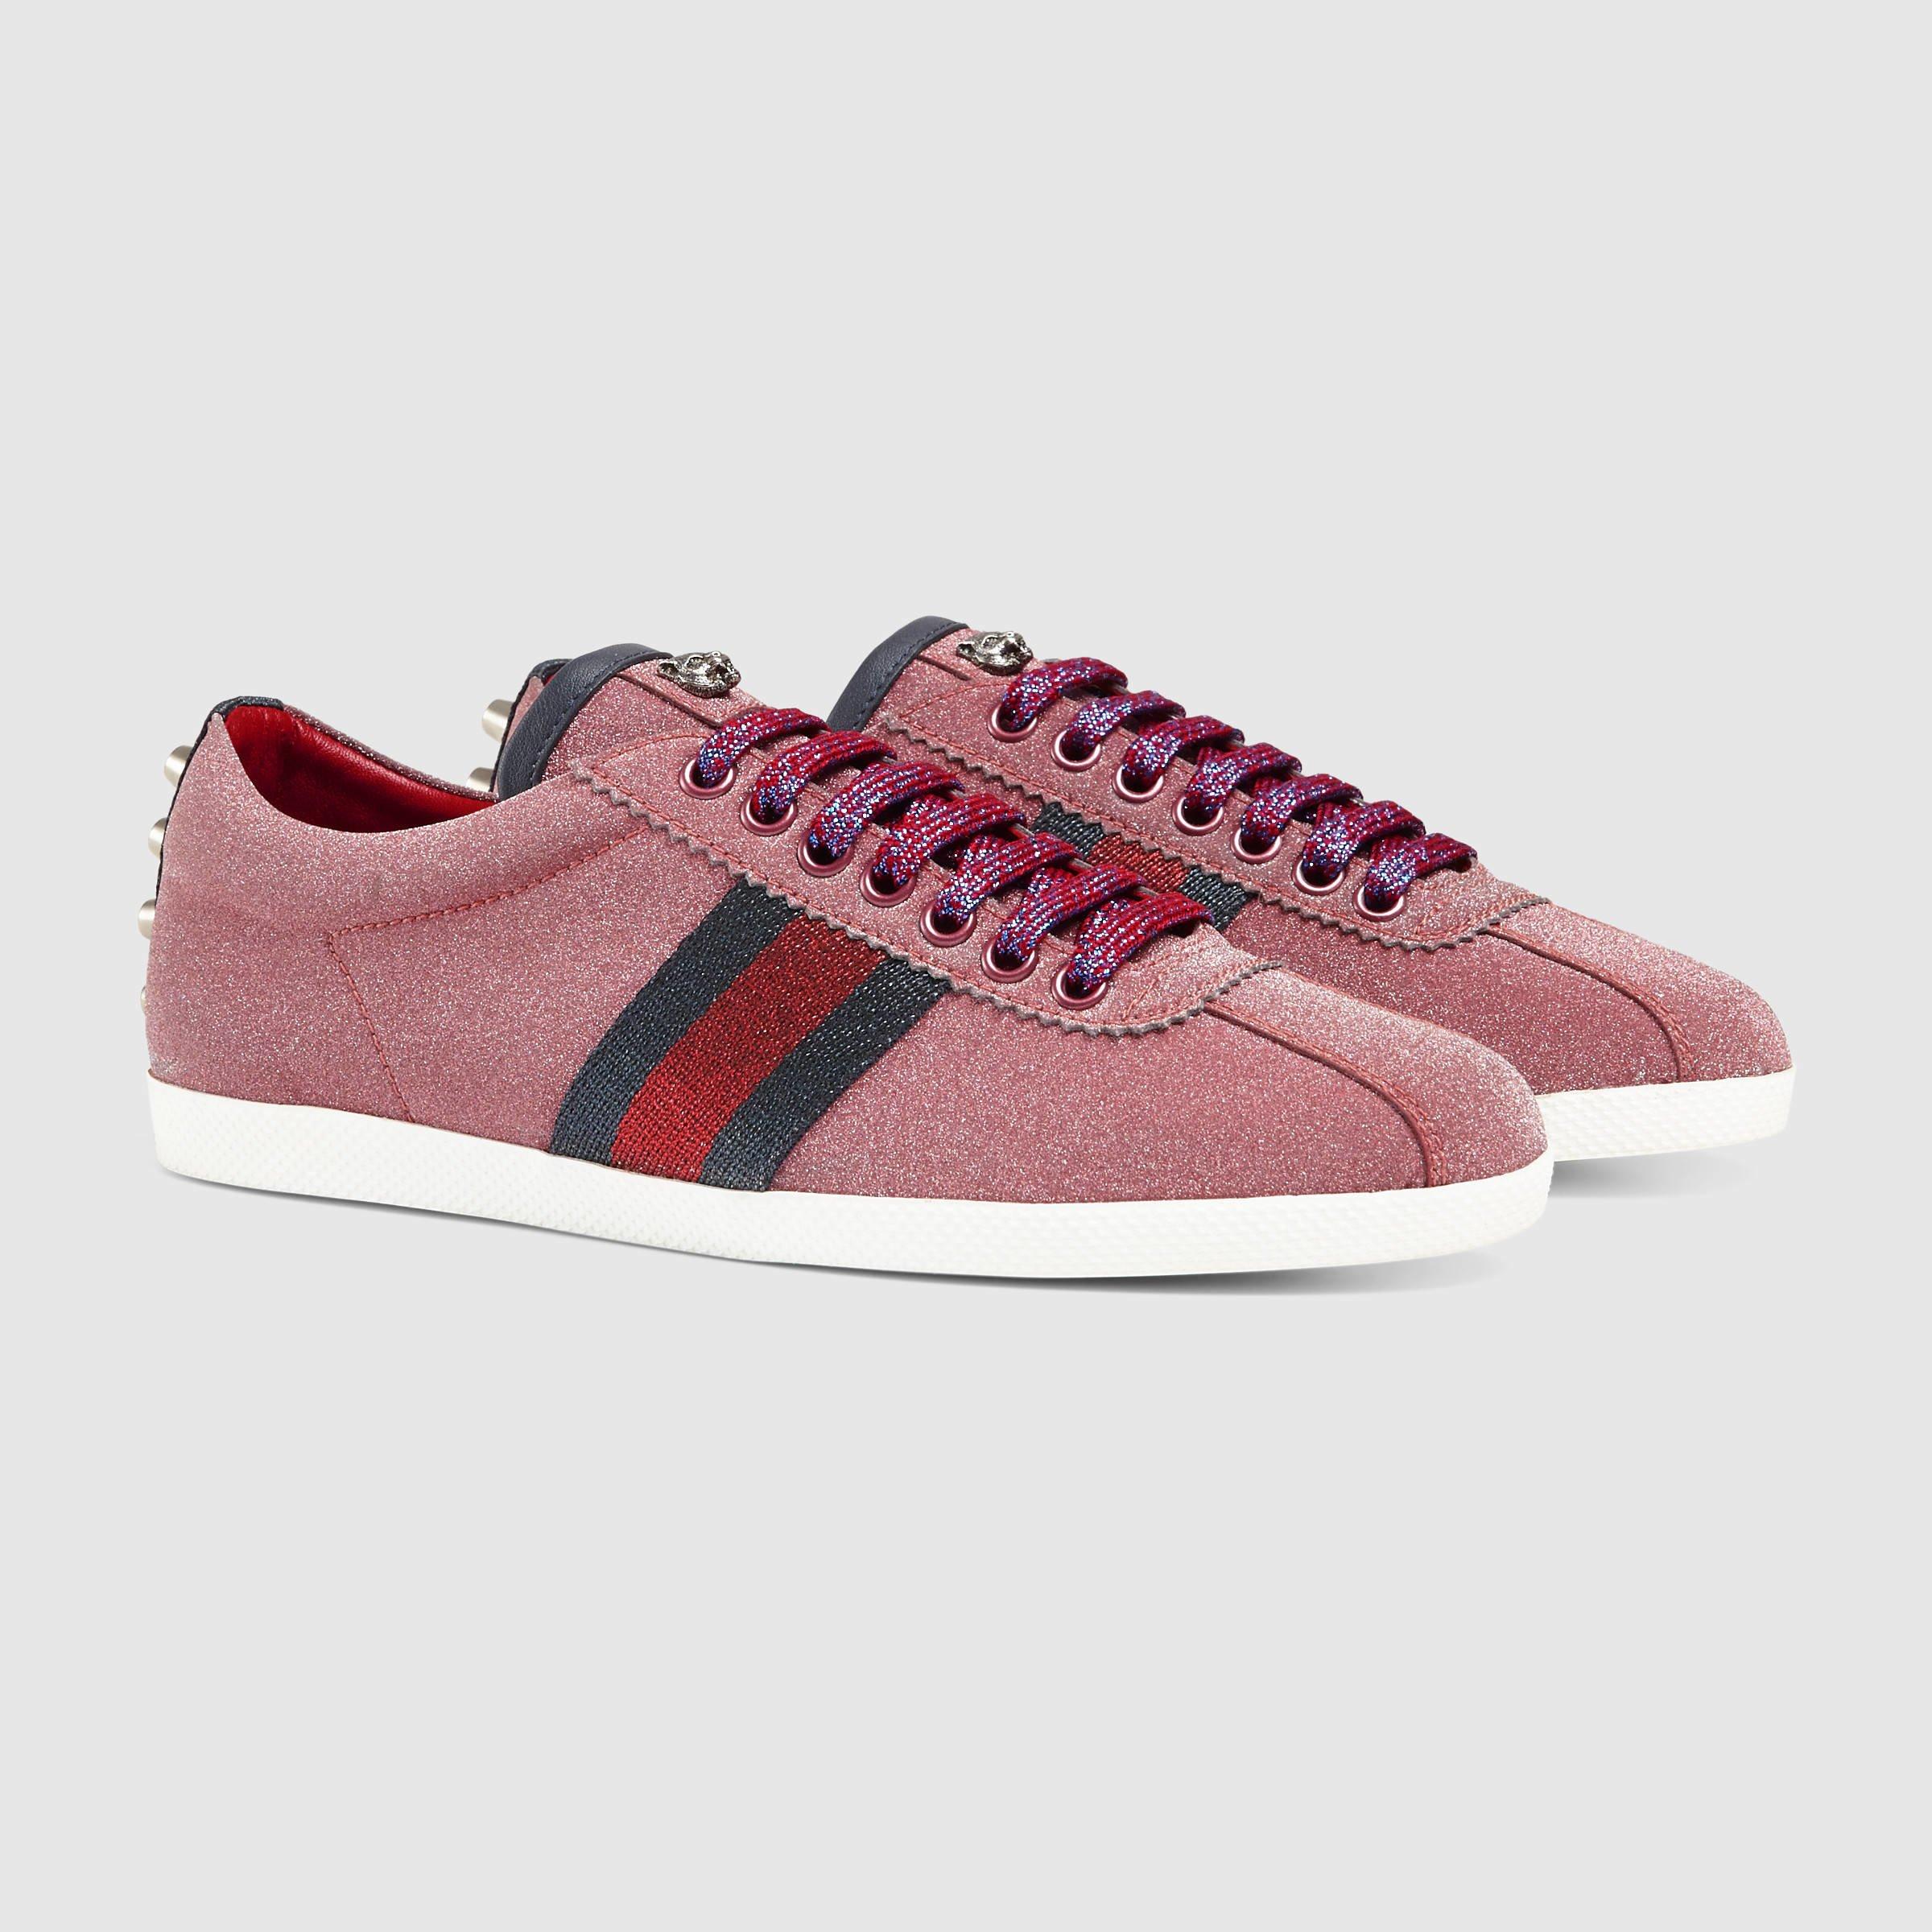 Lyst - Gucci Glitter Web Sneaker in Red